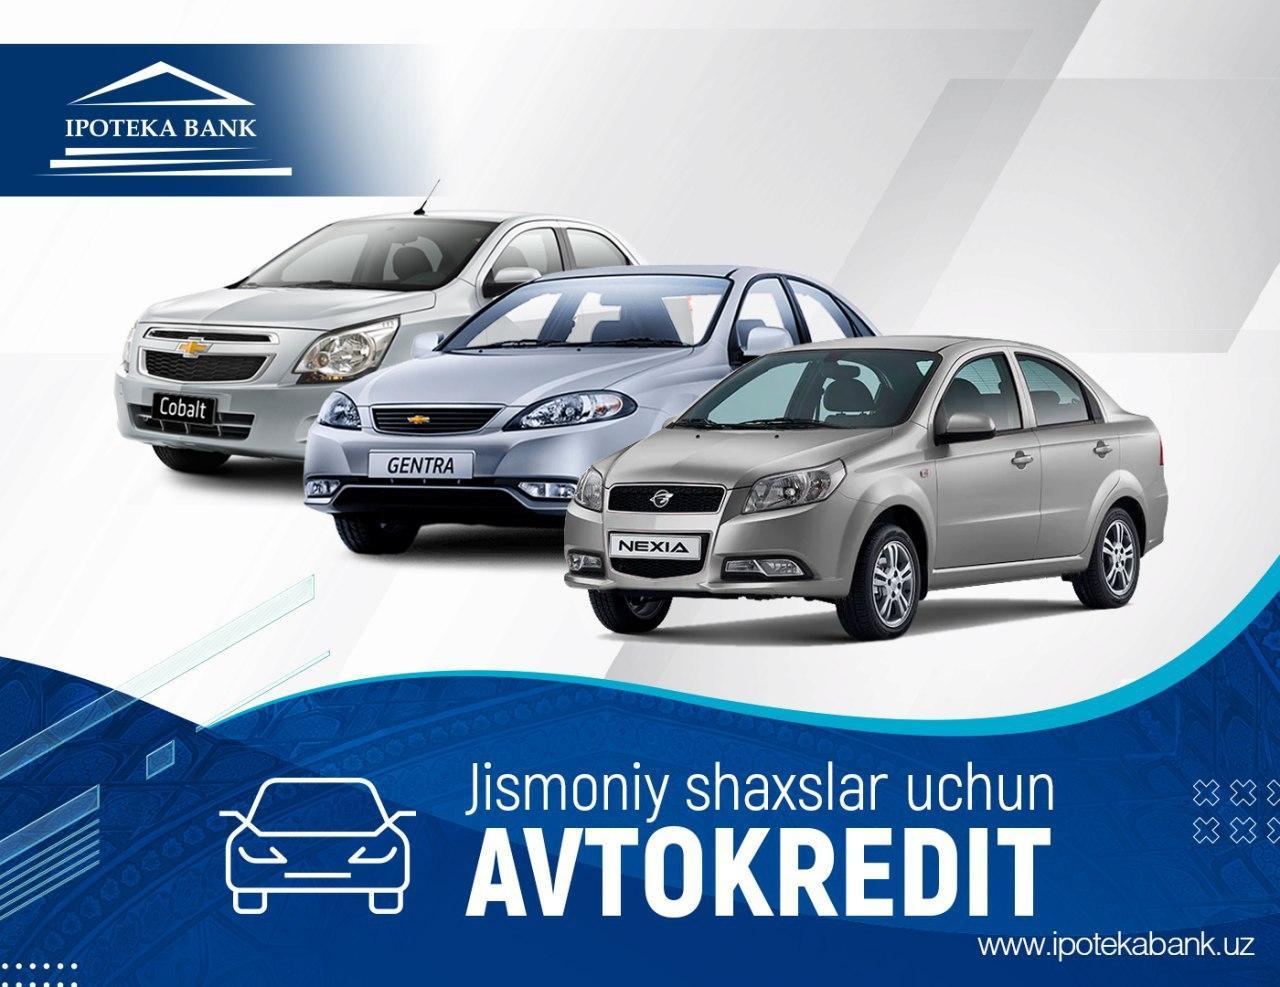 Автокредит в Ипотека банк на автомобили производства UzAuto Motors (GM Uzbekistan)